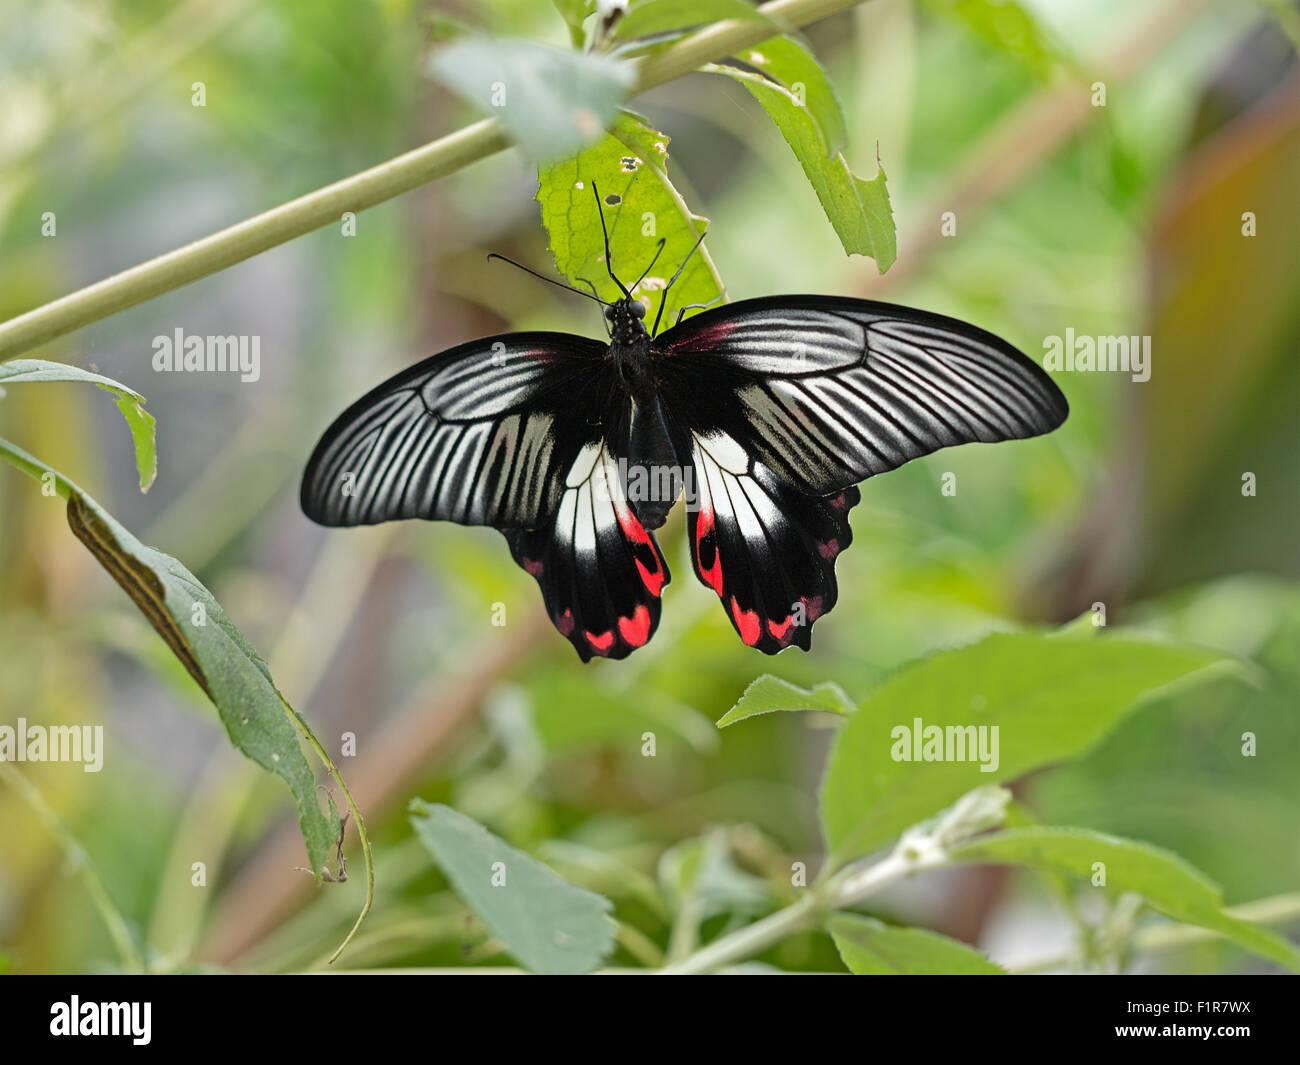 Macro. Papilio rumanzovia. Farfalle tropicali. Immagini Stock